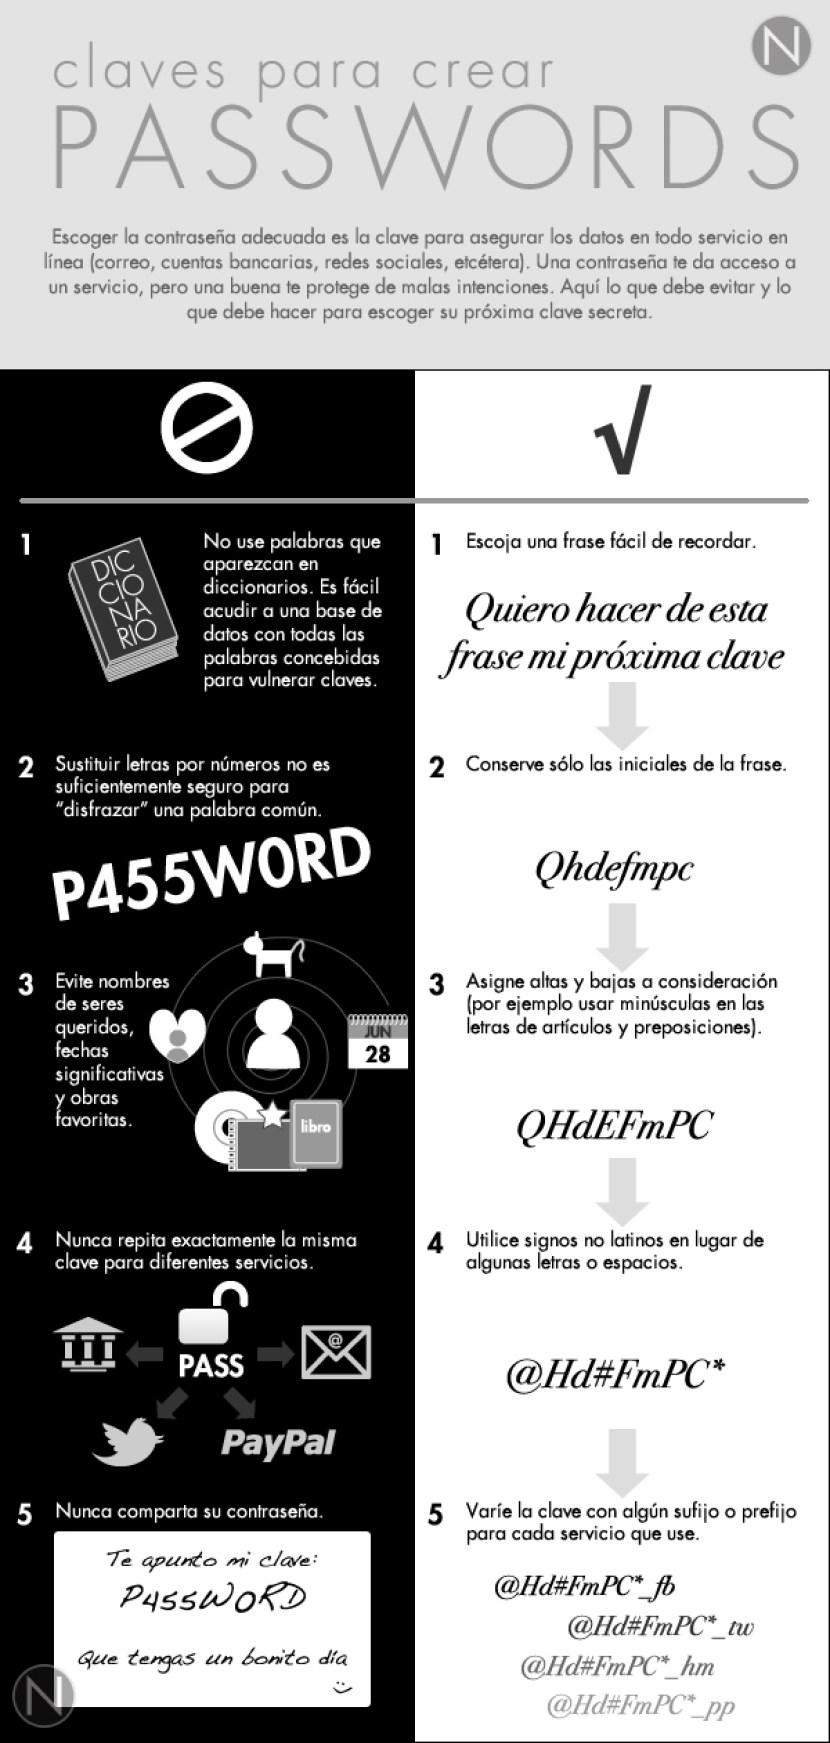 Claves para crear passwords